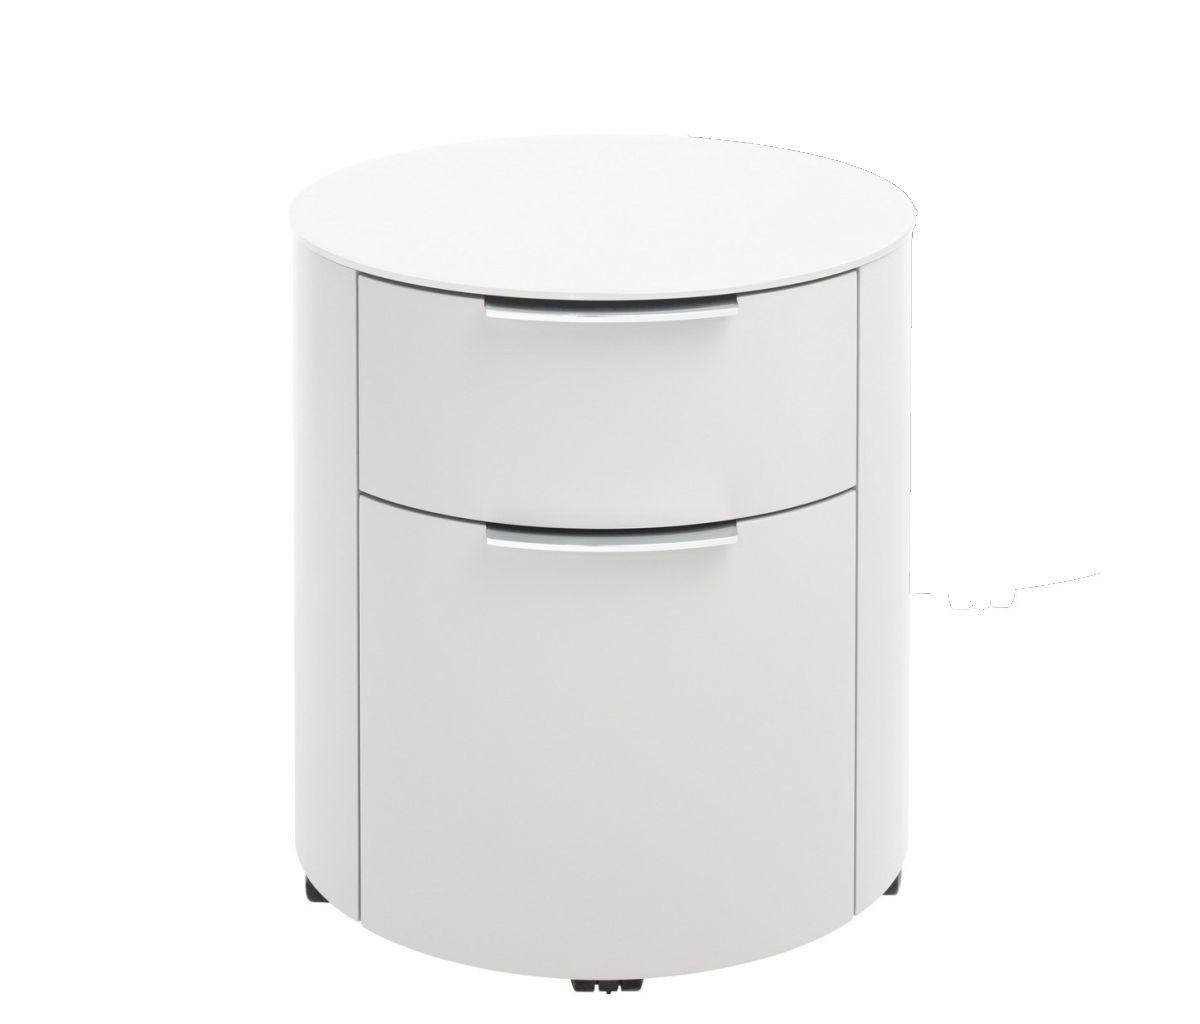 CONGA Rundkommode 5505 Ausführung nach Kundenwunsch